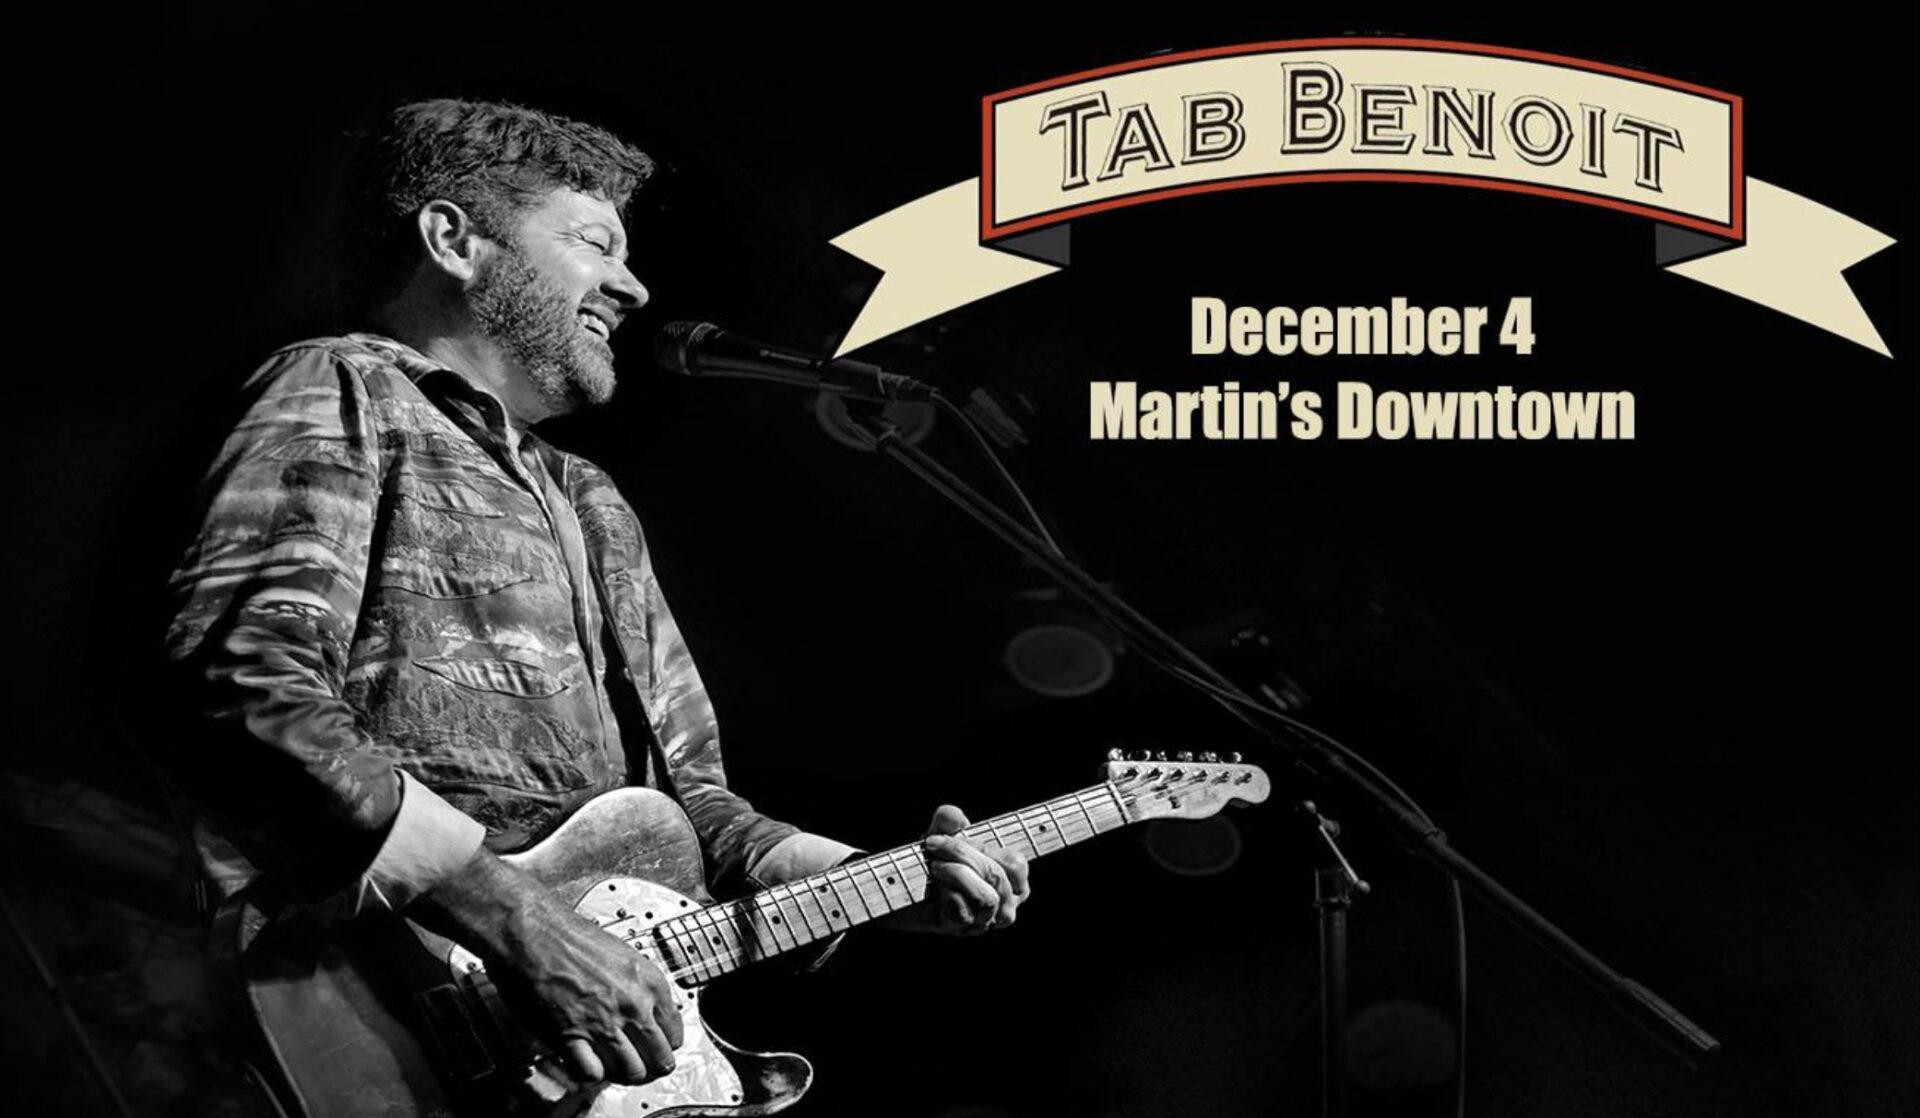 Tab Benoit at Martin's Downtown